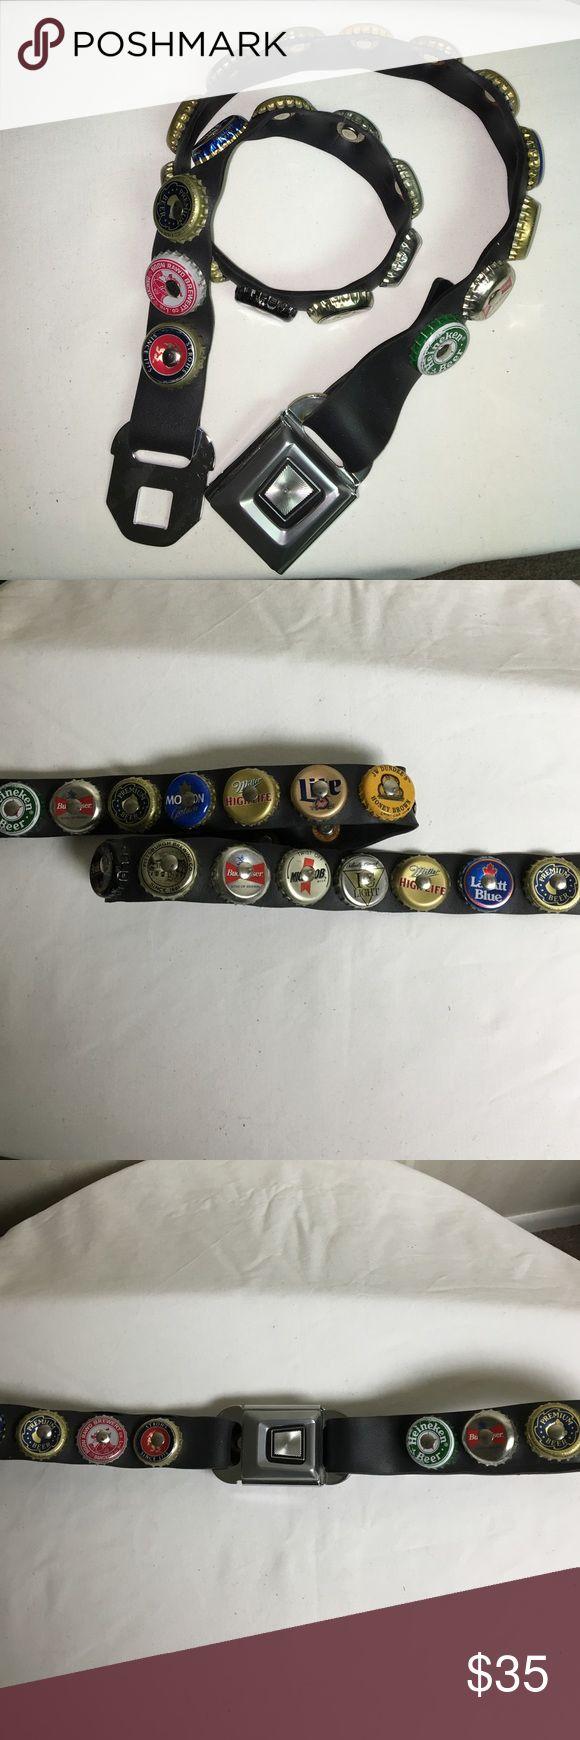 "Vintage unisex belt Seat belt bottle cap belt. Approx 17 1/2"" when buckled. Accessories Belts"